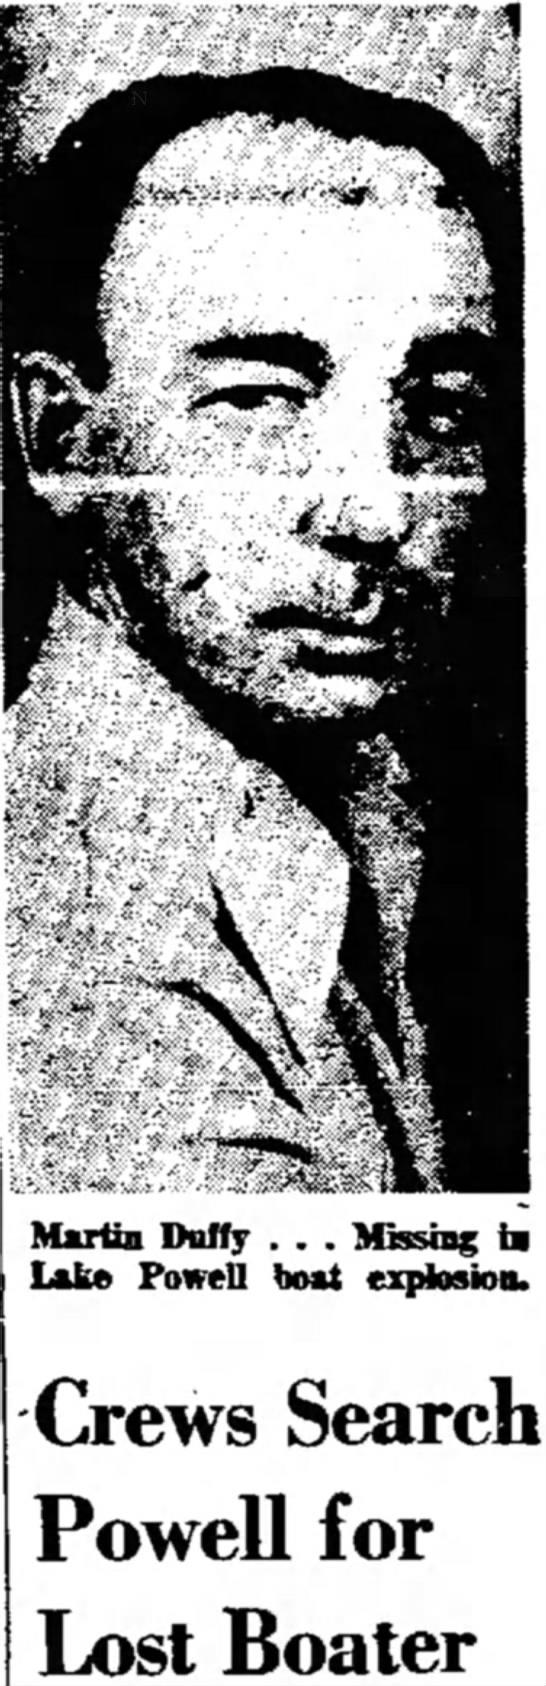 SL Tribune, UT - 26 May 1964, Pg 13 - Martin Duffy - Sunday boat explosion - Martin Duffy . . . Missing hi Lake Powell boat...